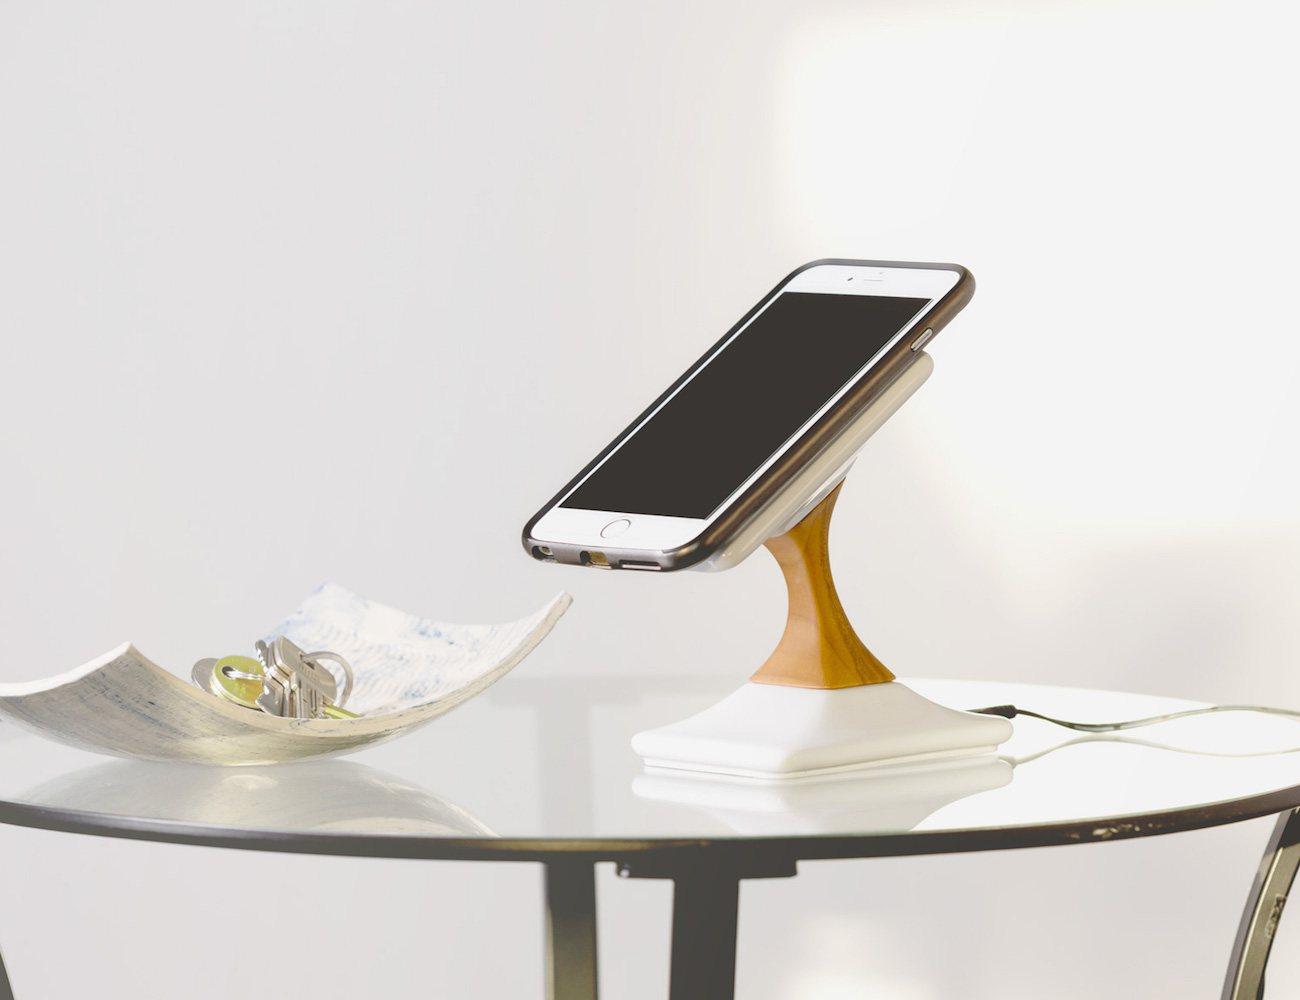 SWICH Wireless Charging Stand